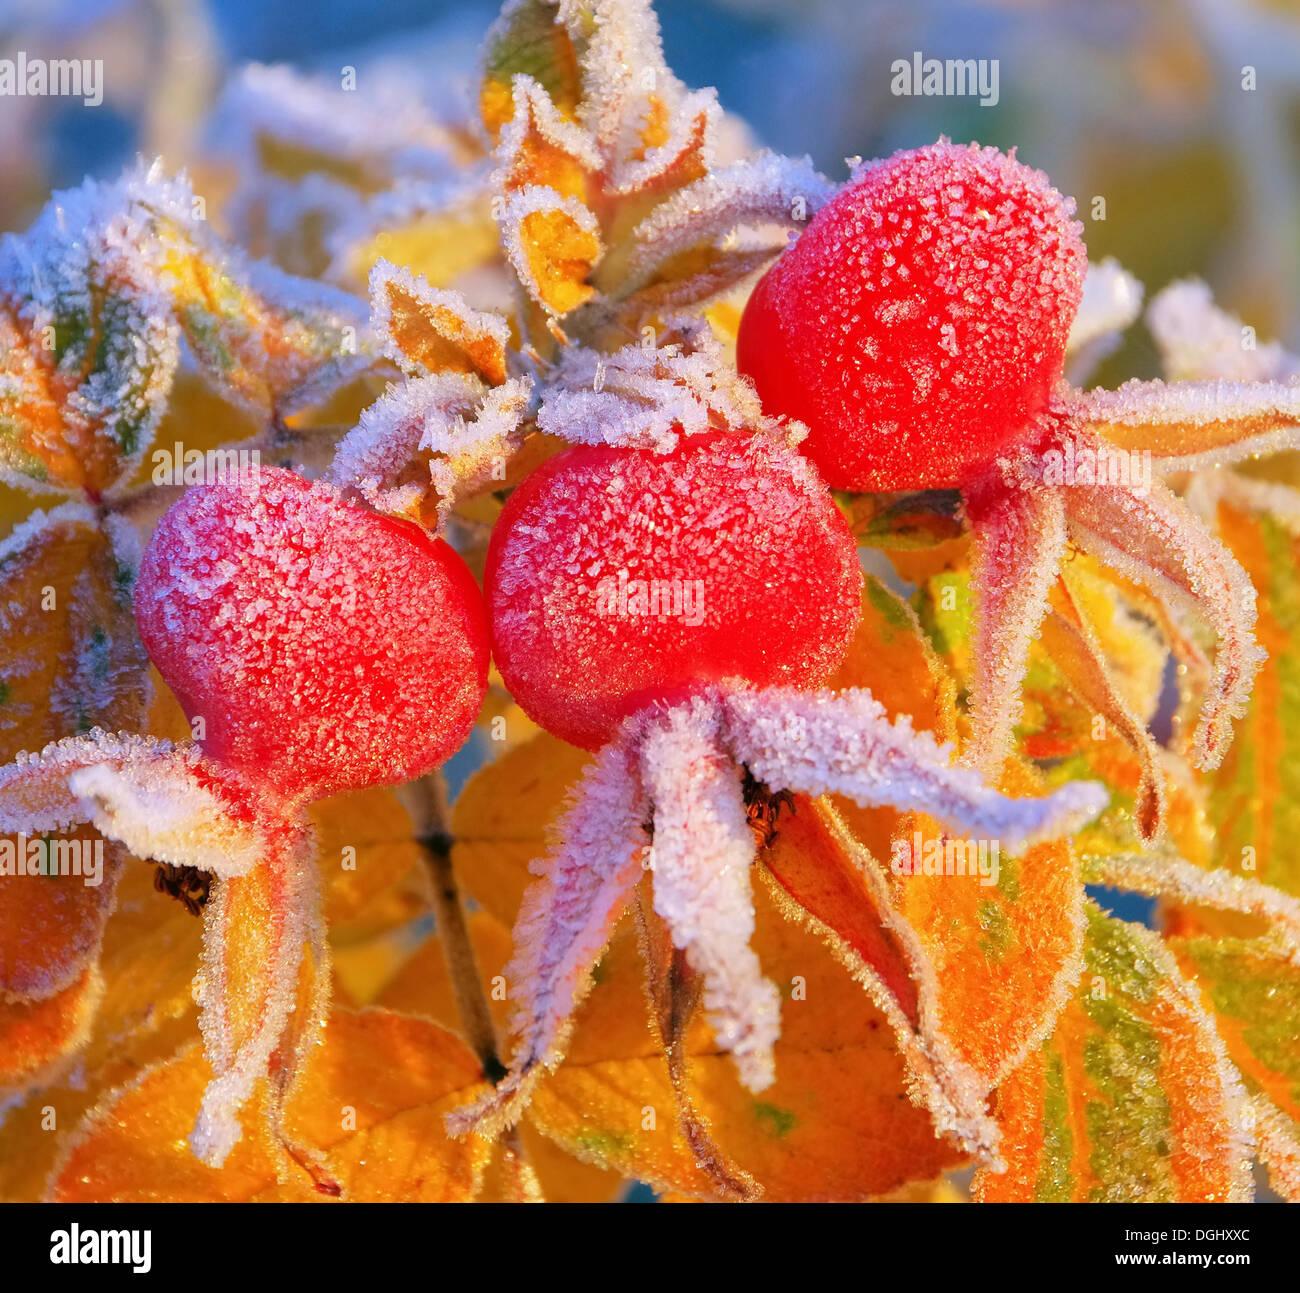 Hagebutte im Winter - hip in winter 08 - Stock Image